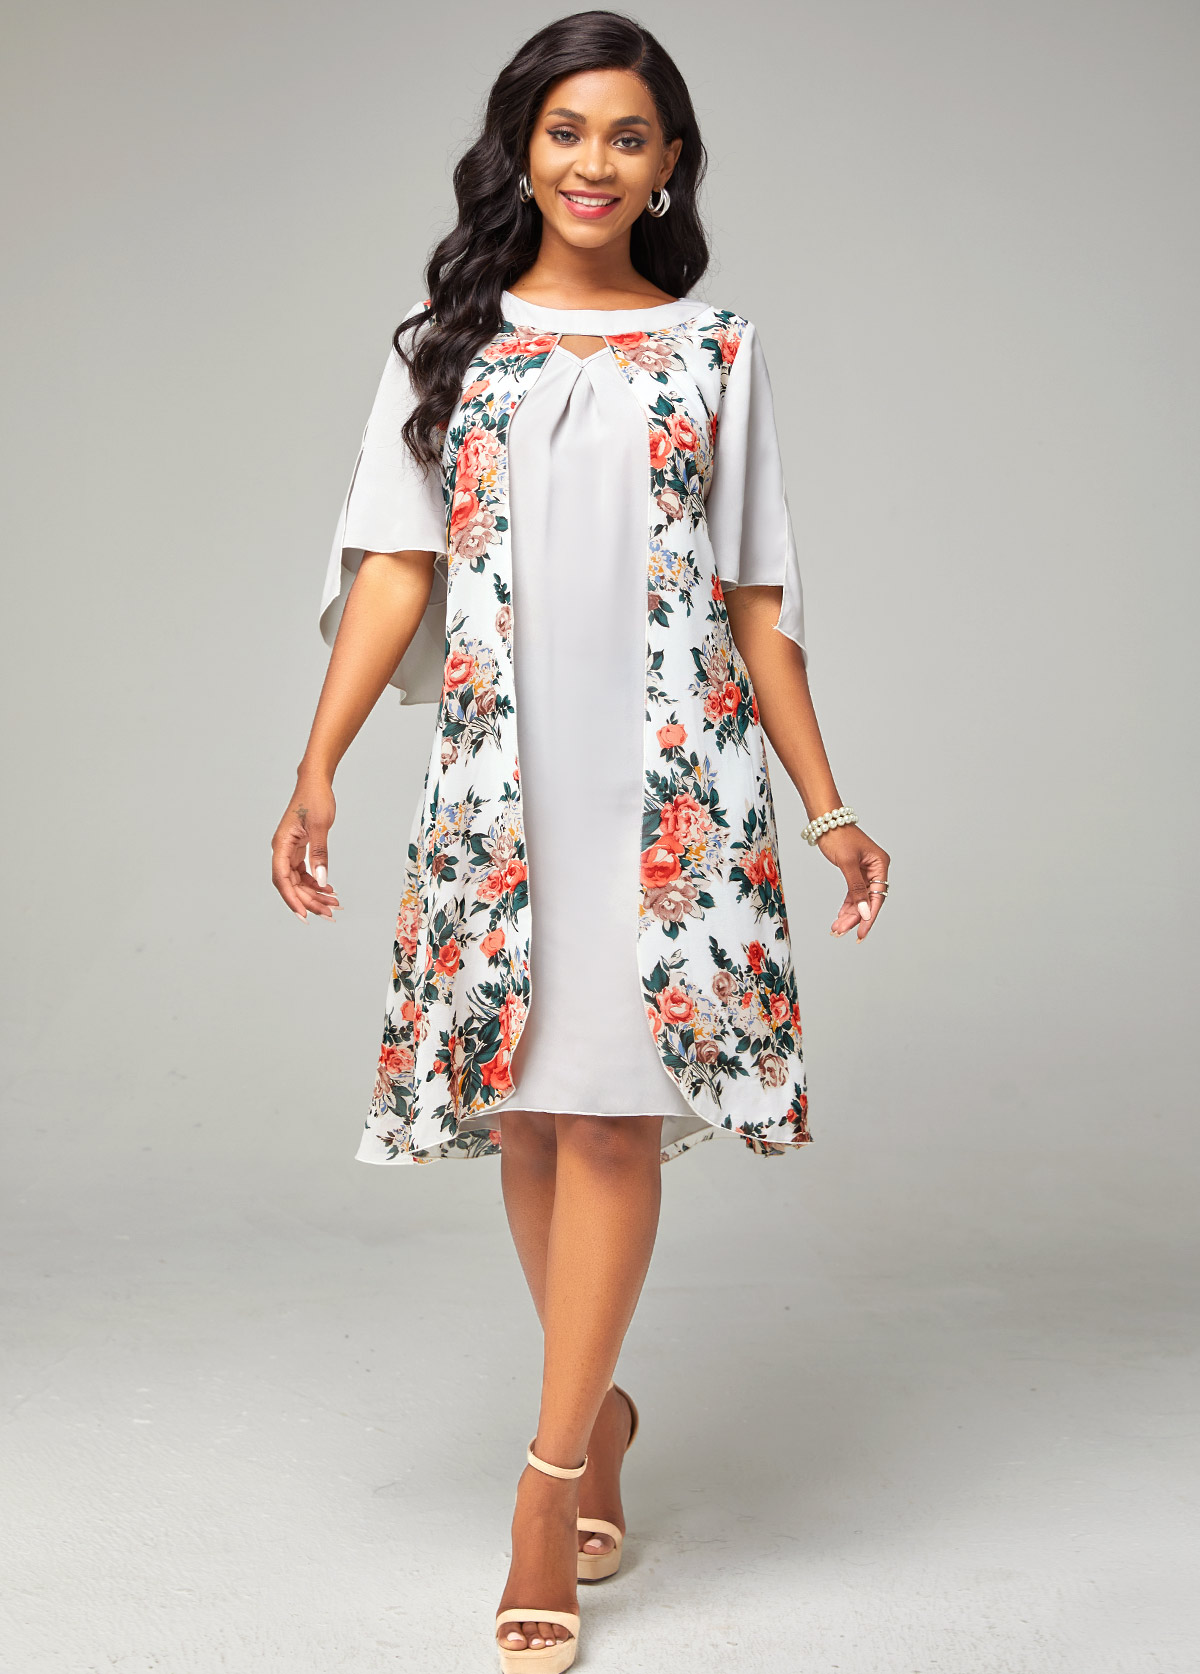 Keyhole Neckline Chiffon Floral Print Dress